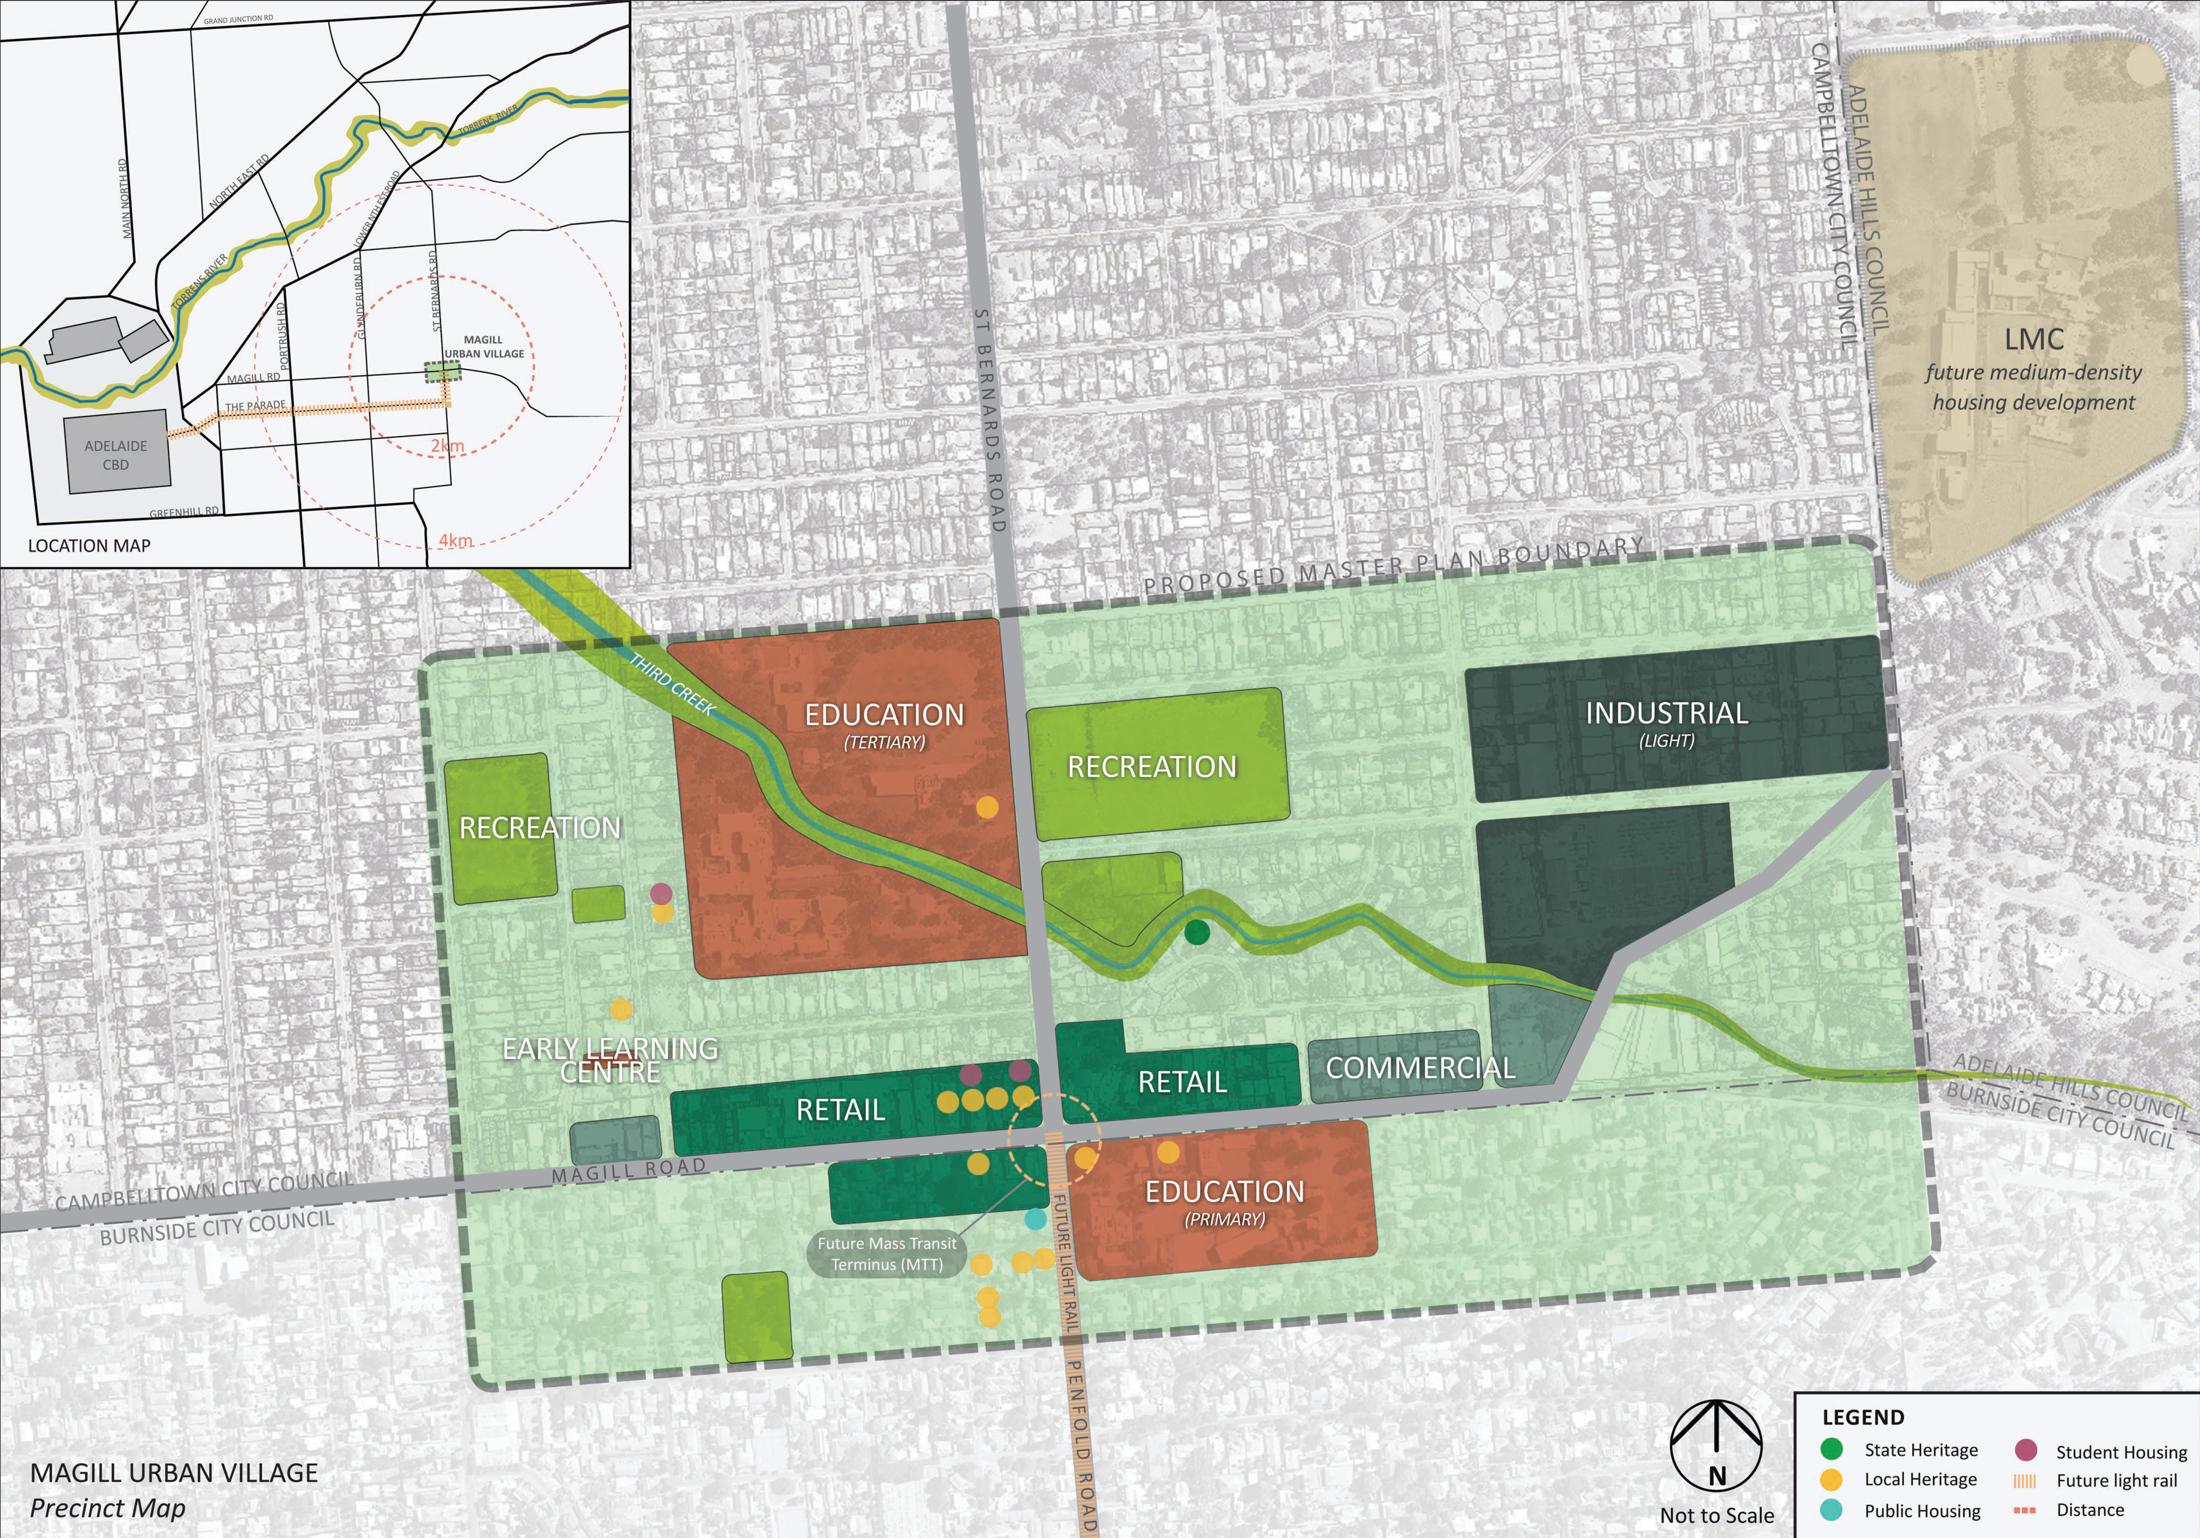 Magill Urban Village Masterplan